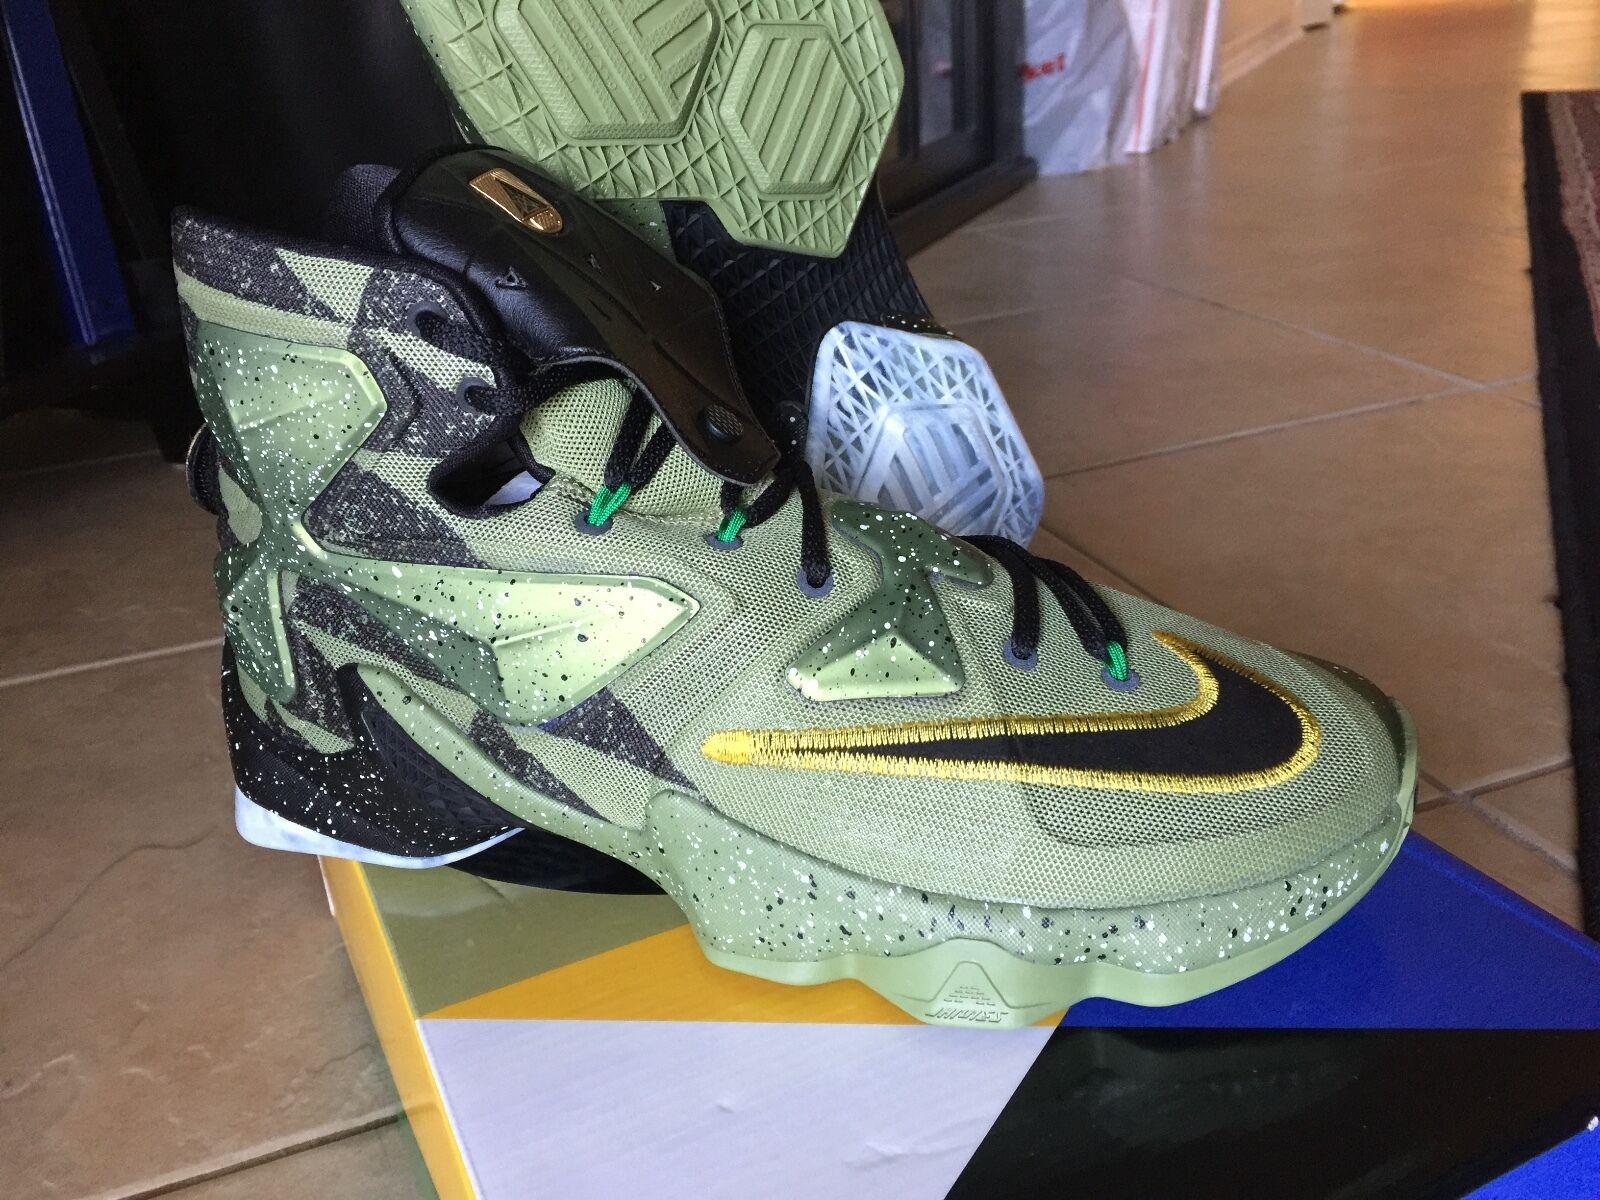 Nike air lebron xii all - star - game 10,5 asg 13 10,5 game 10 9,5 8 - 12 11 schwarz - gold 38696a